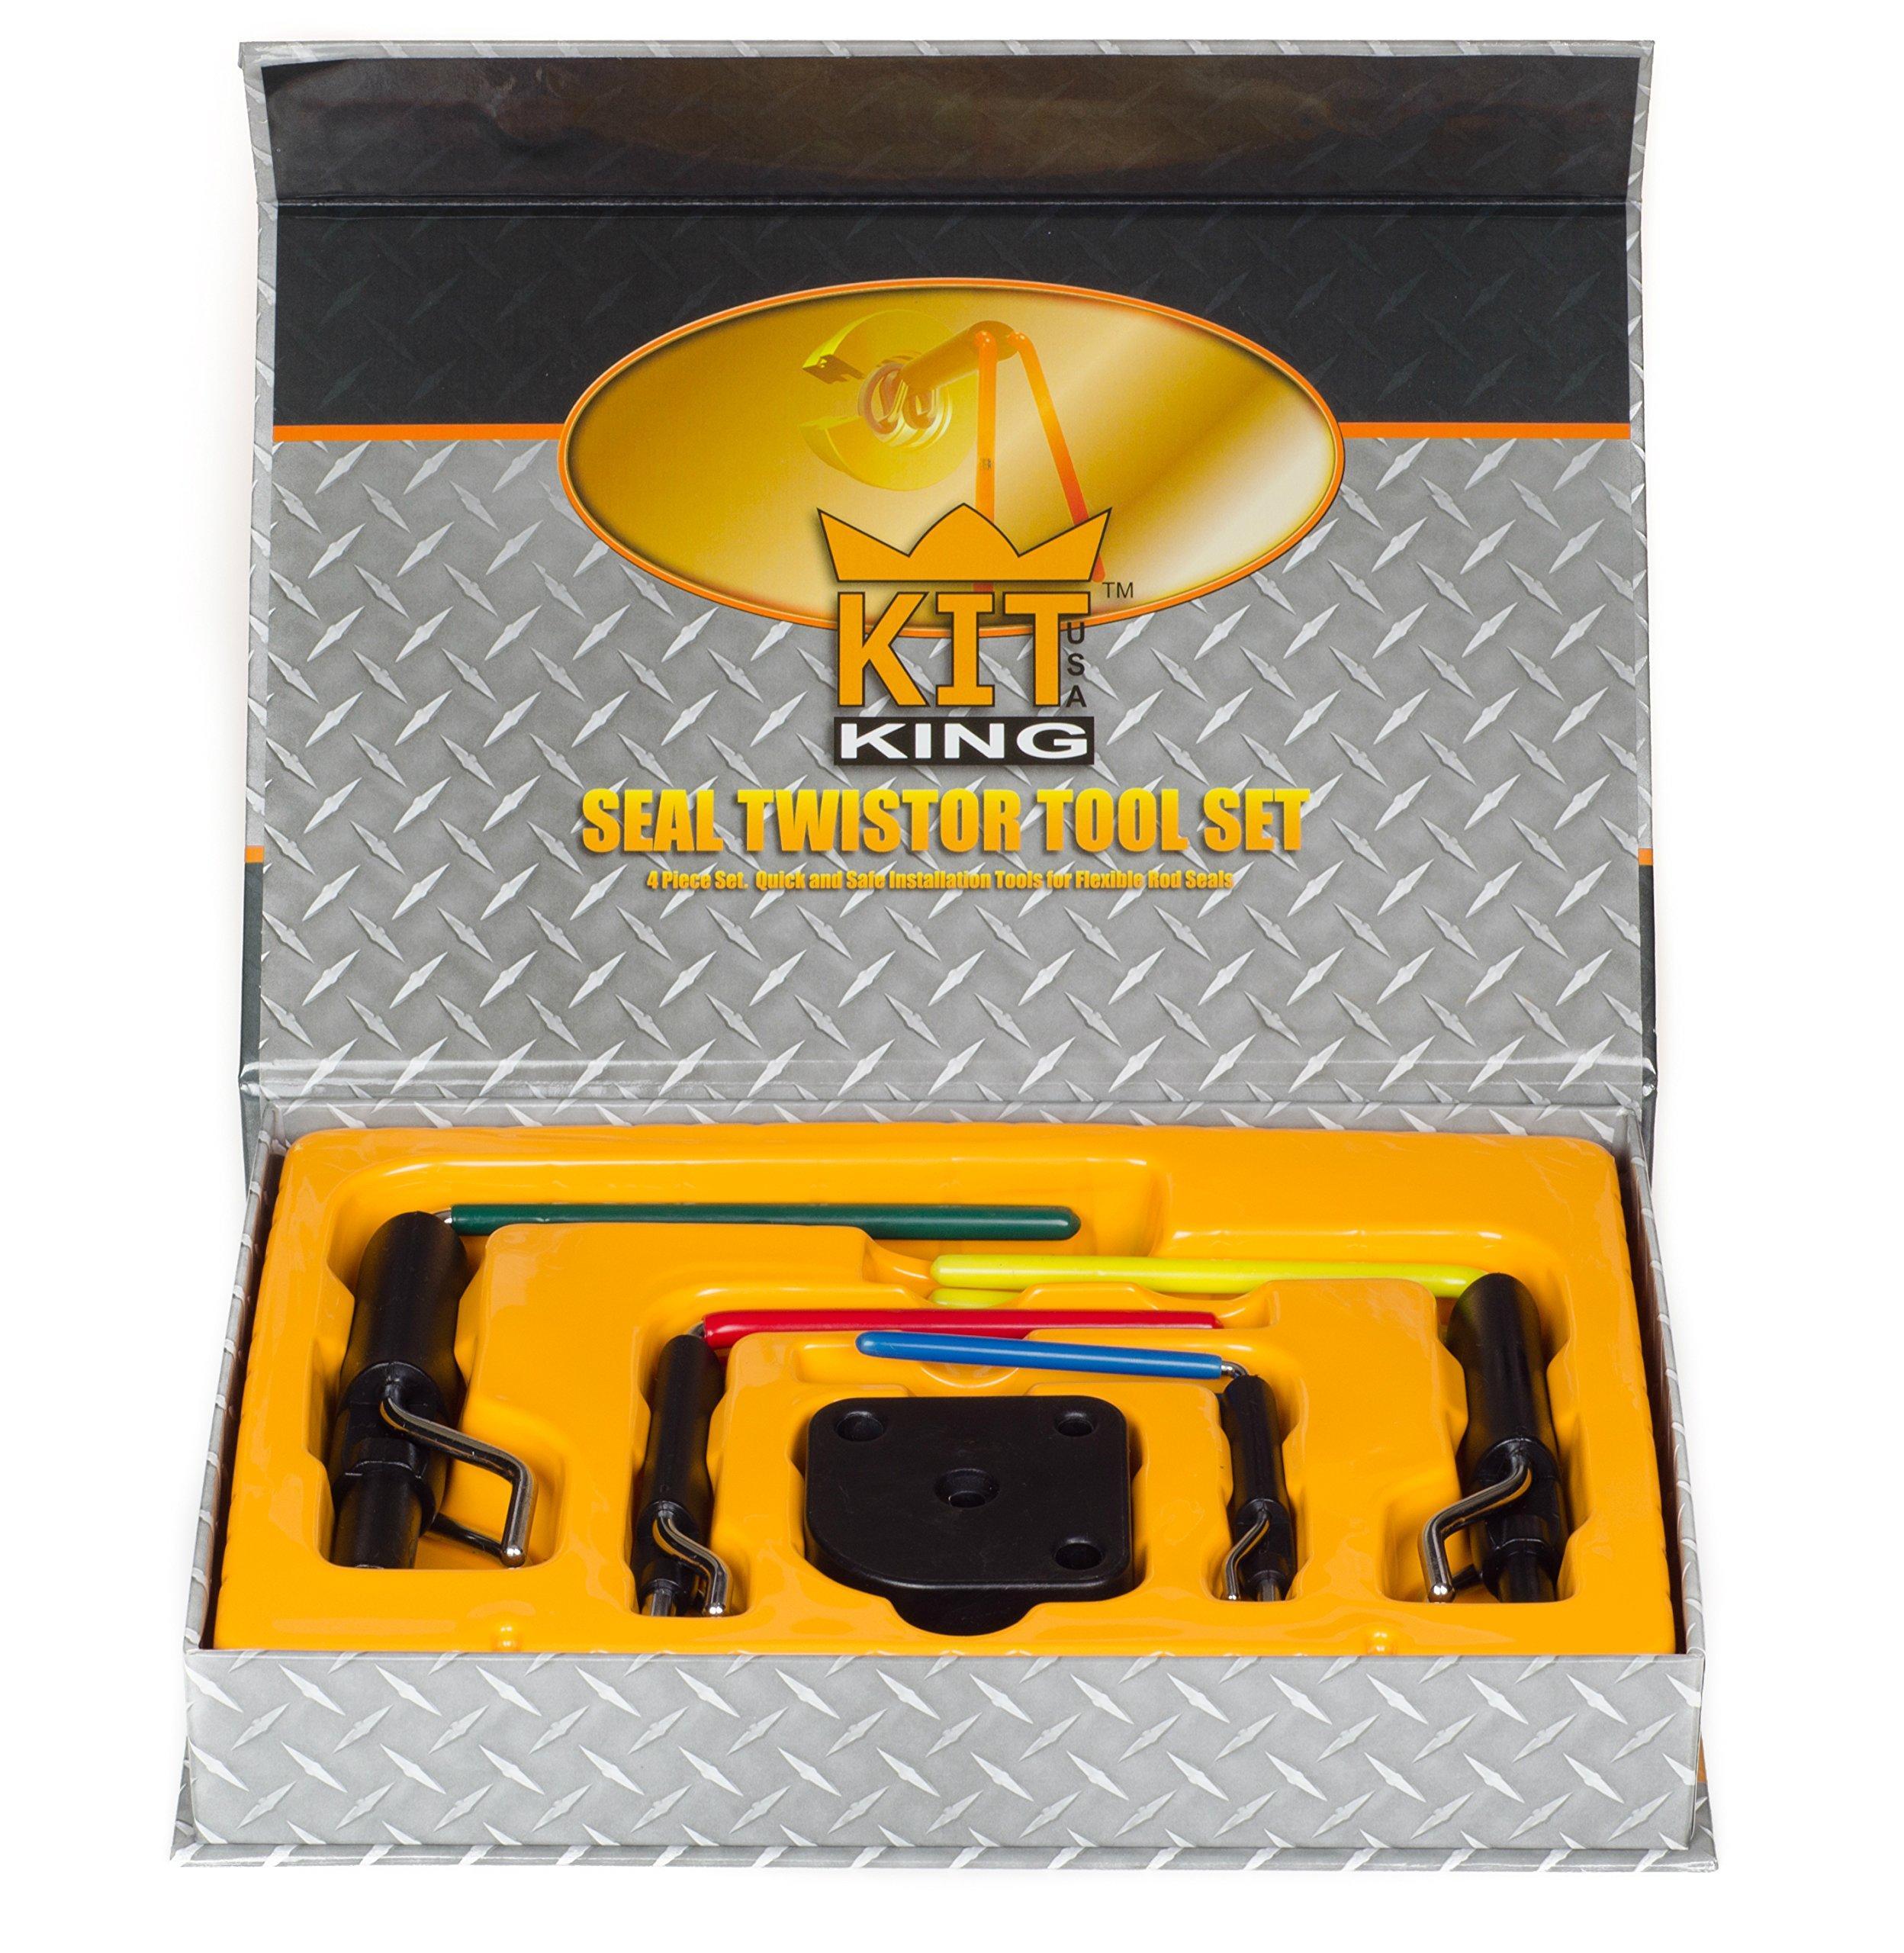 Kit King - Rod Seal Install Tool Set